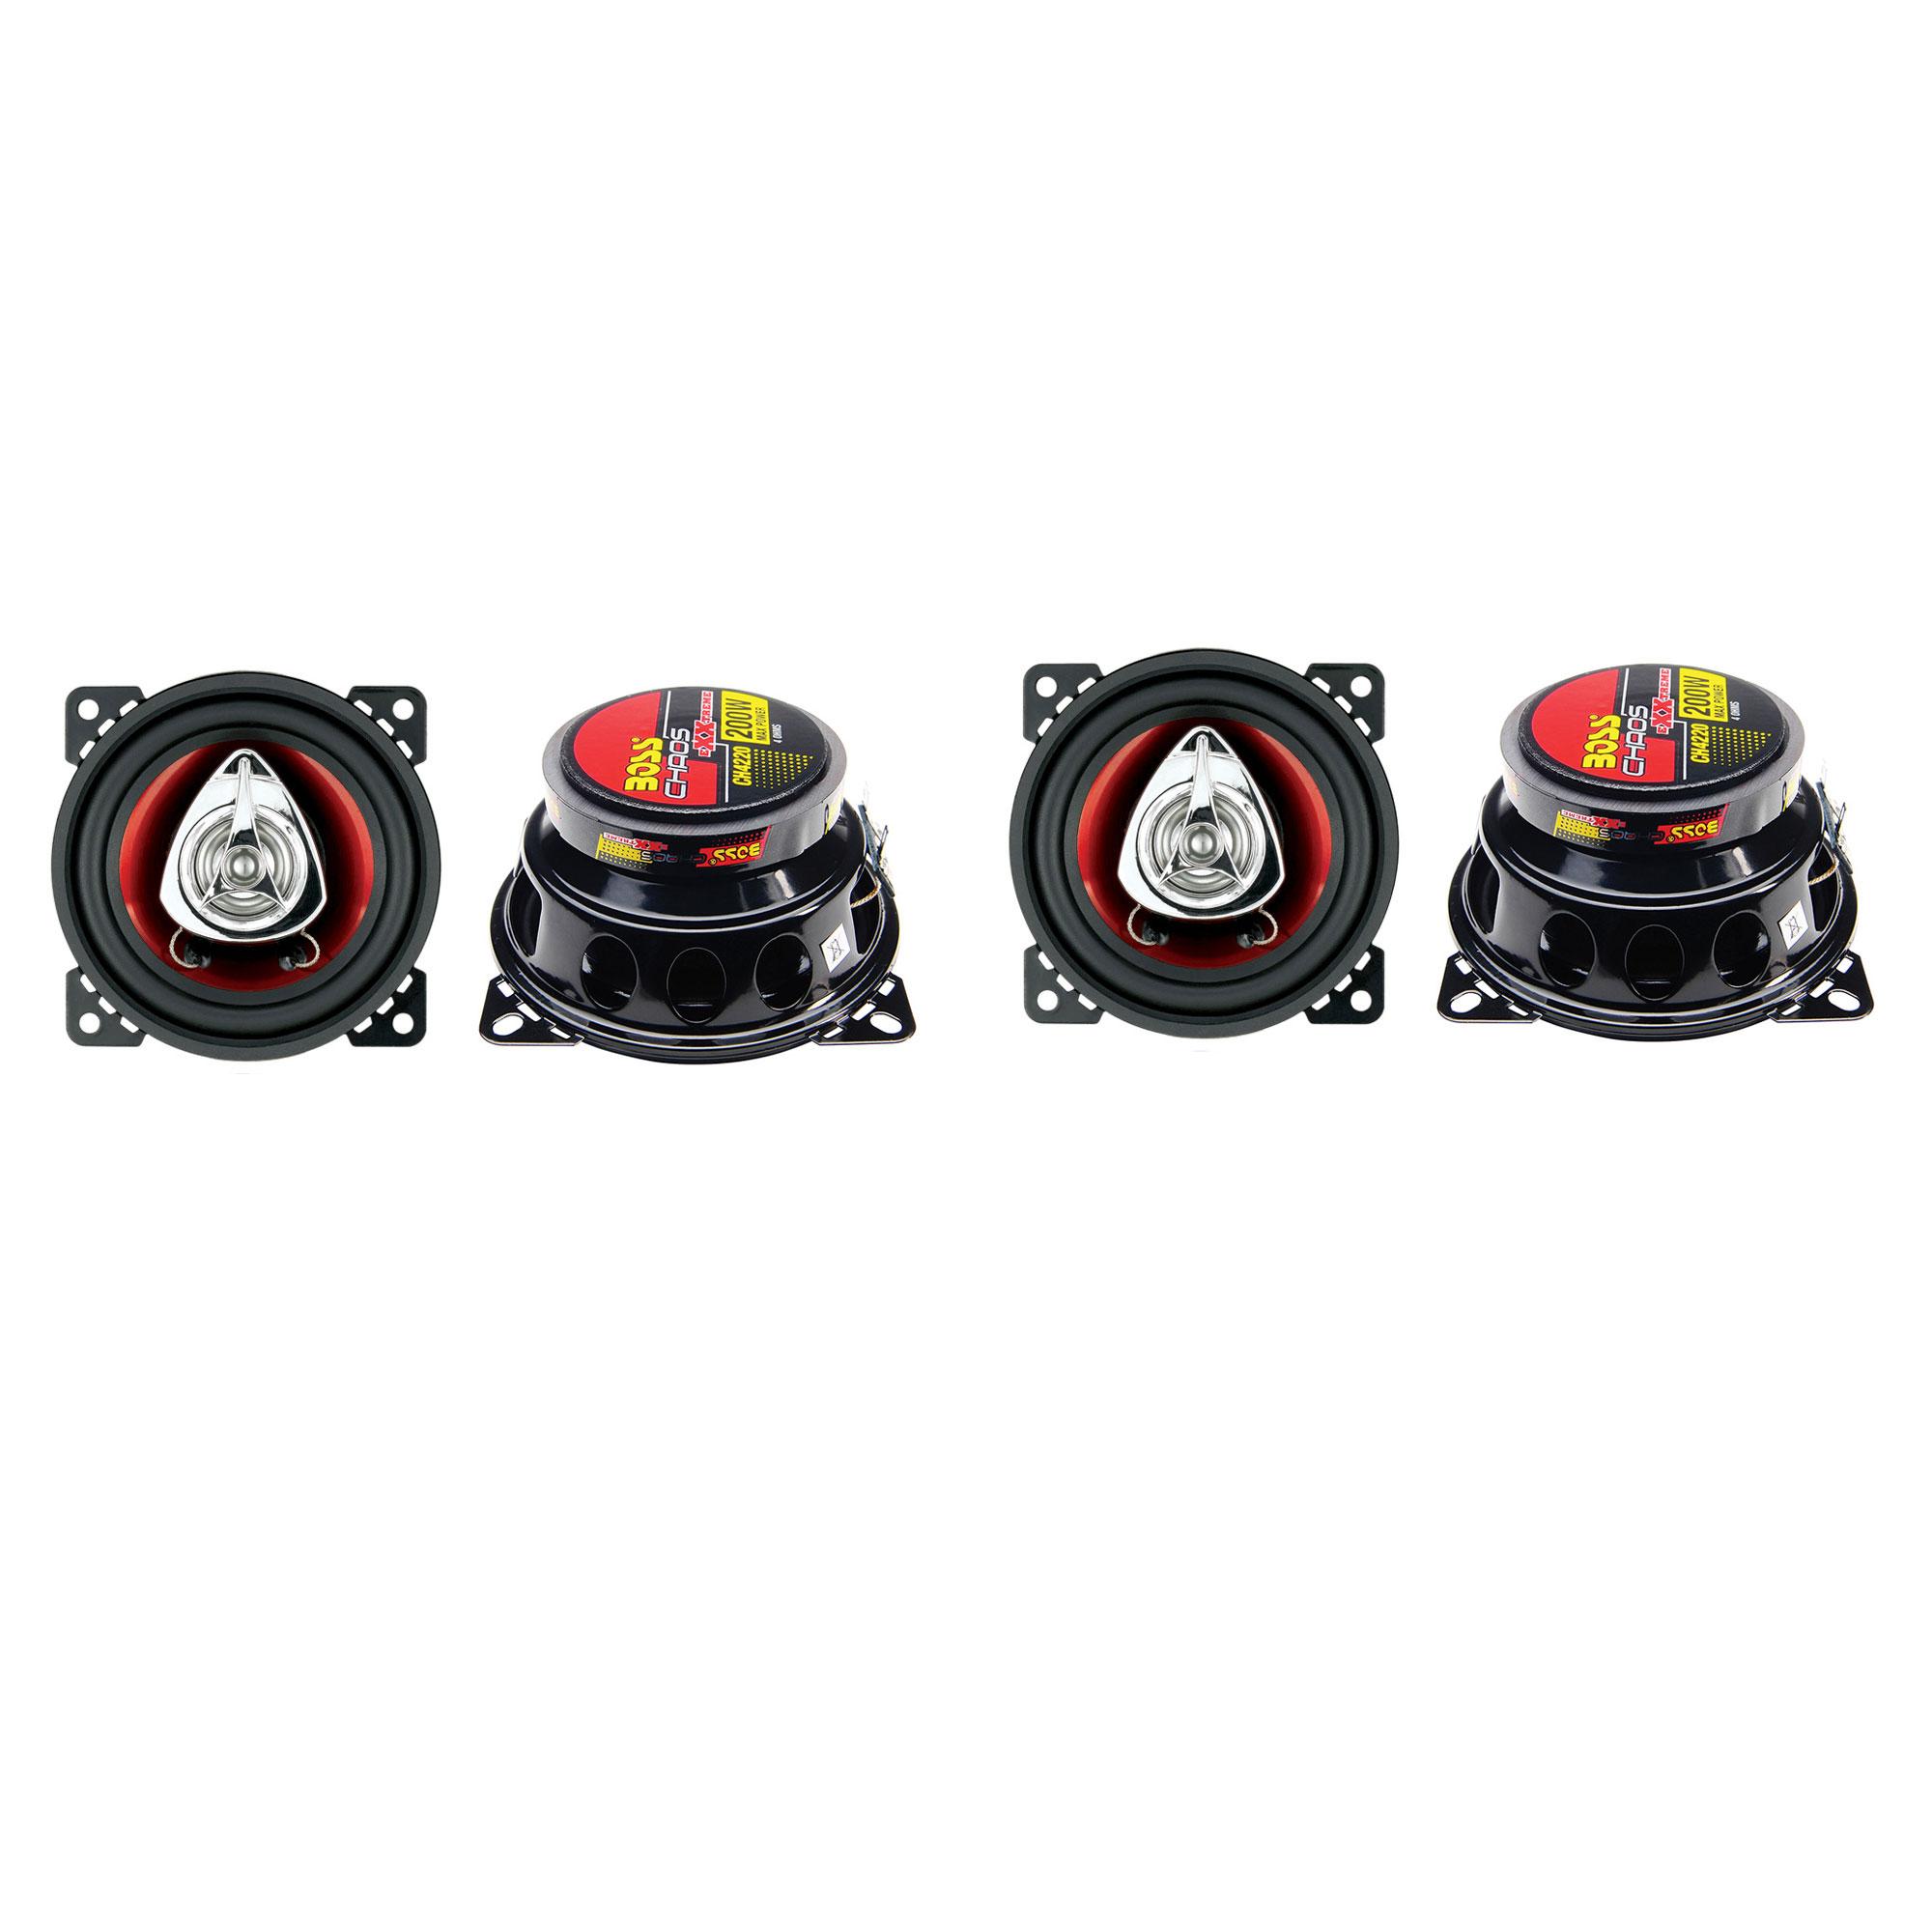 Chiptuning power box FIAT DUCATO 2.8 JTD 127 HP PS diesel NEW chip tuning parts